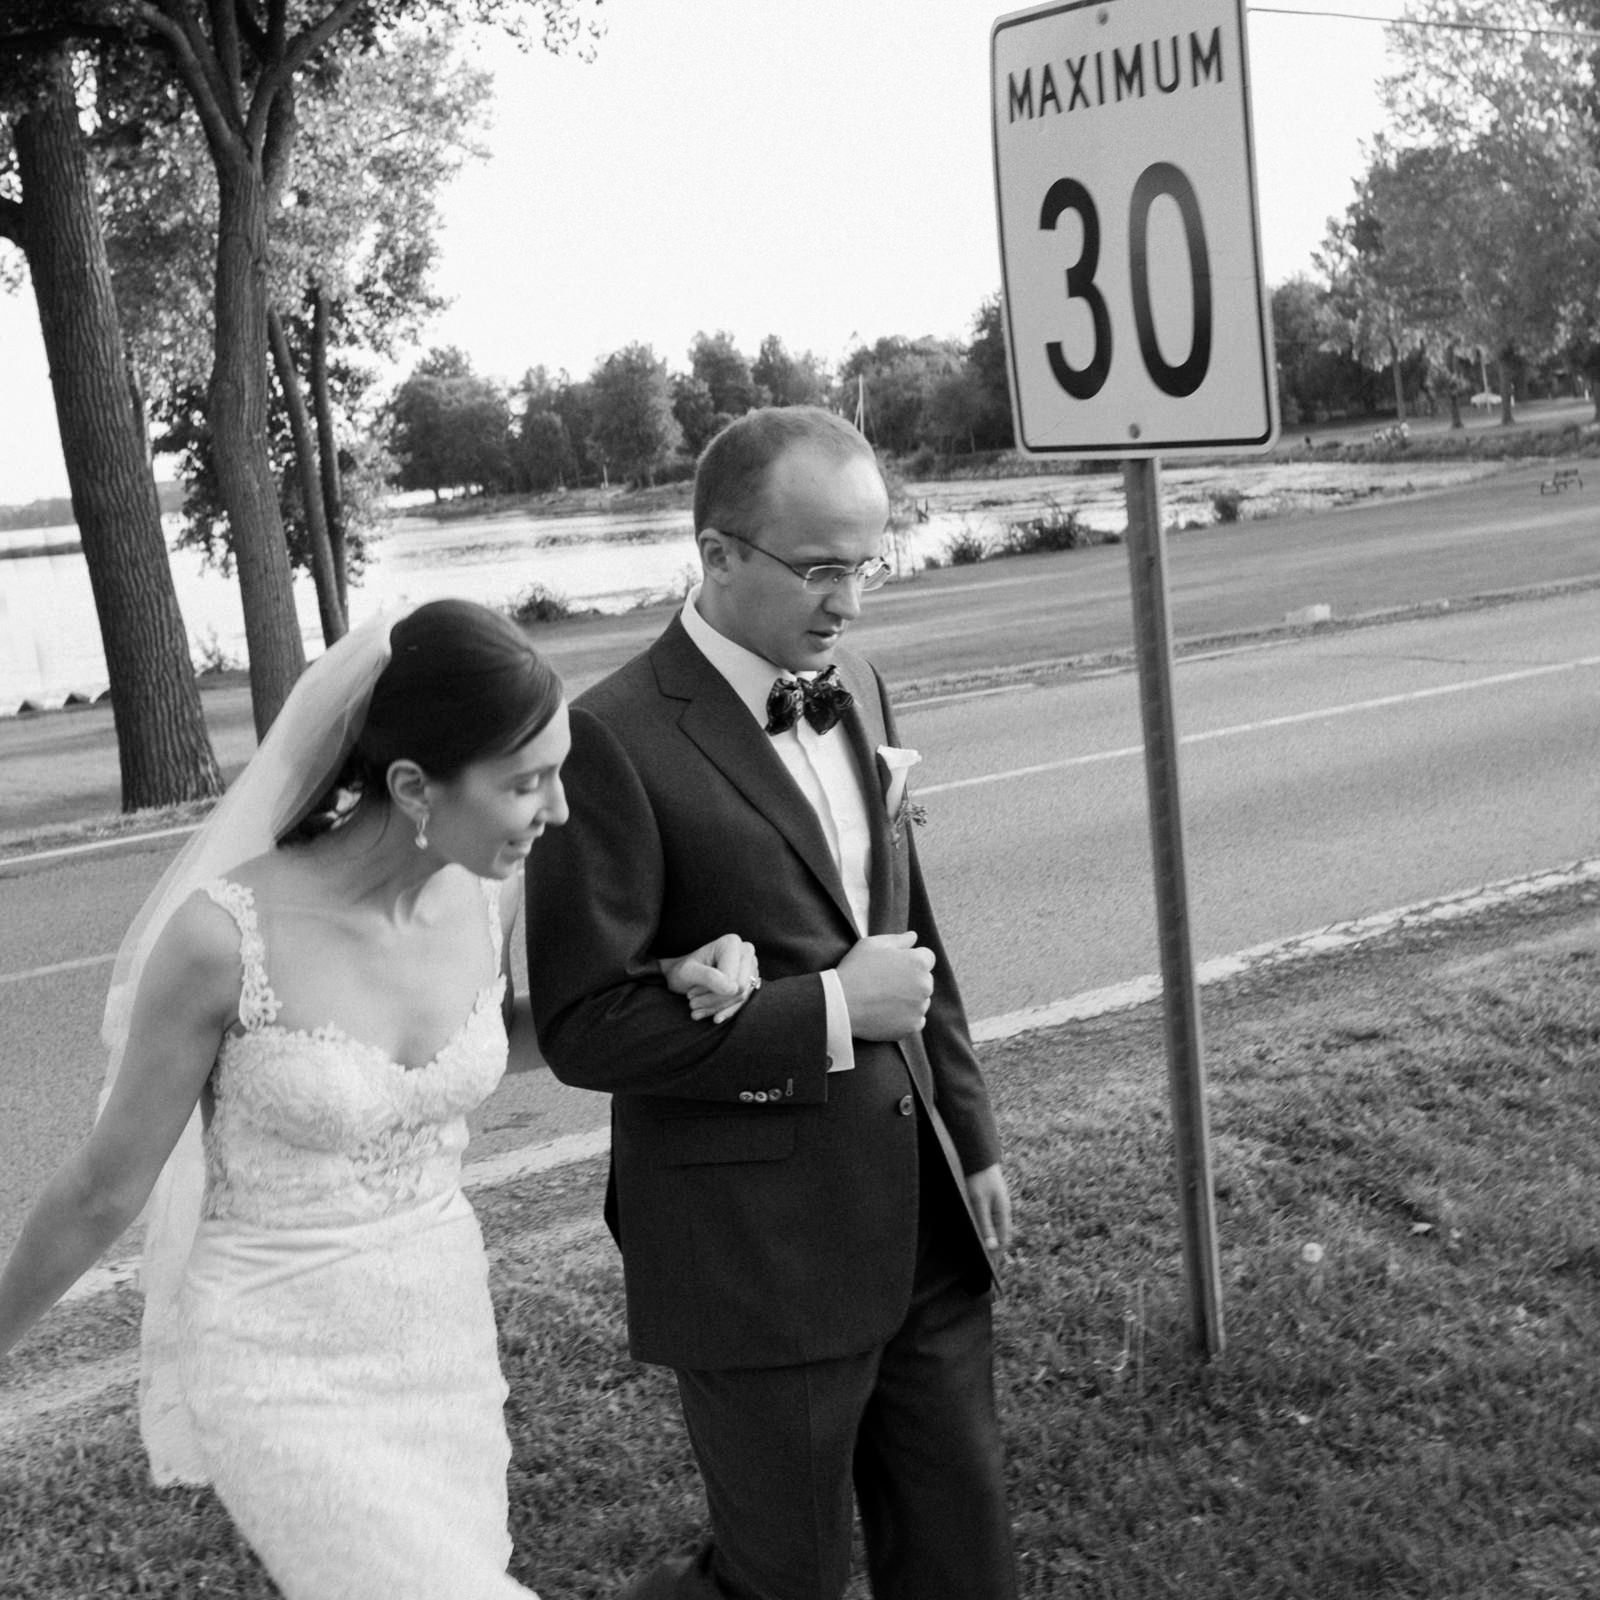 Baie-d'Urfe Fritz Farm wedding, Montreal bride and groom portrait.jpg